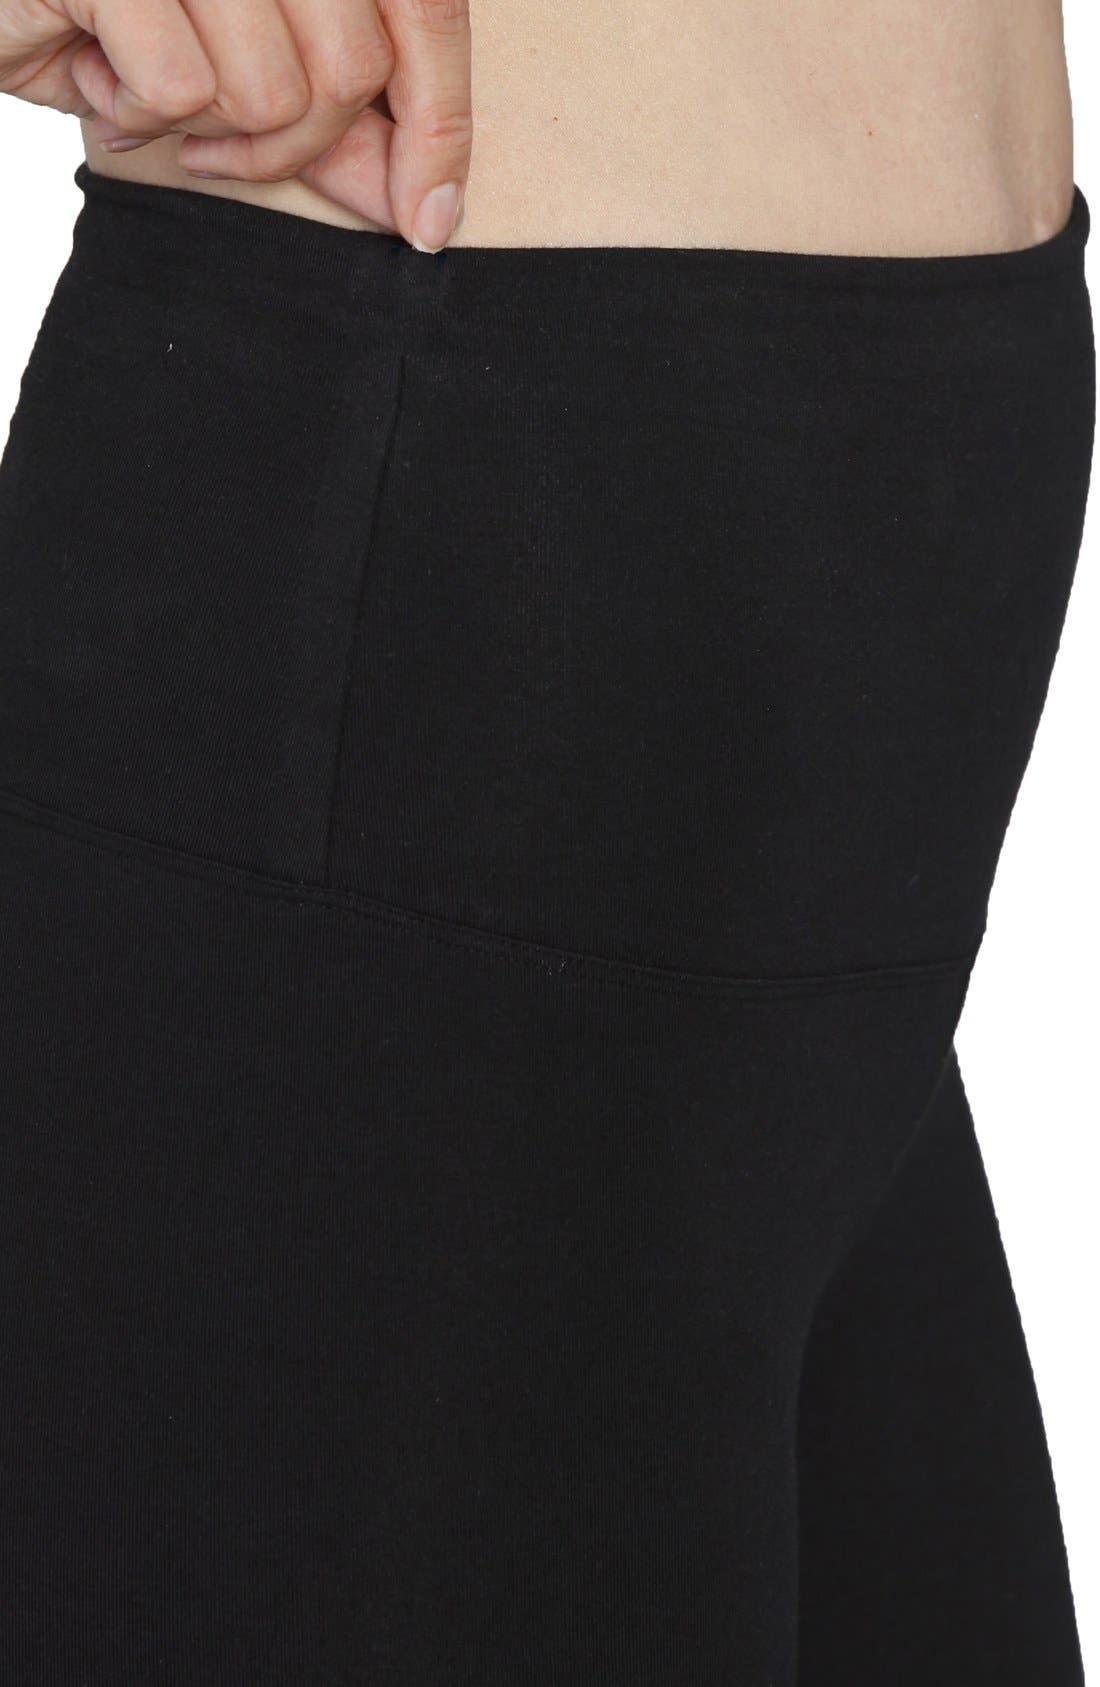 'Tummy Tight' Postpartum Leggings,                             Alternate thumbnail 3, color,                             BLACK